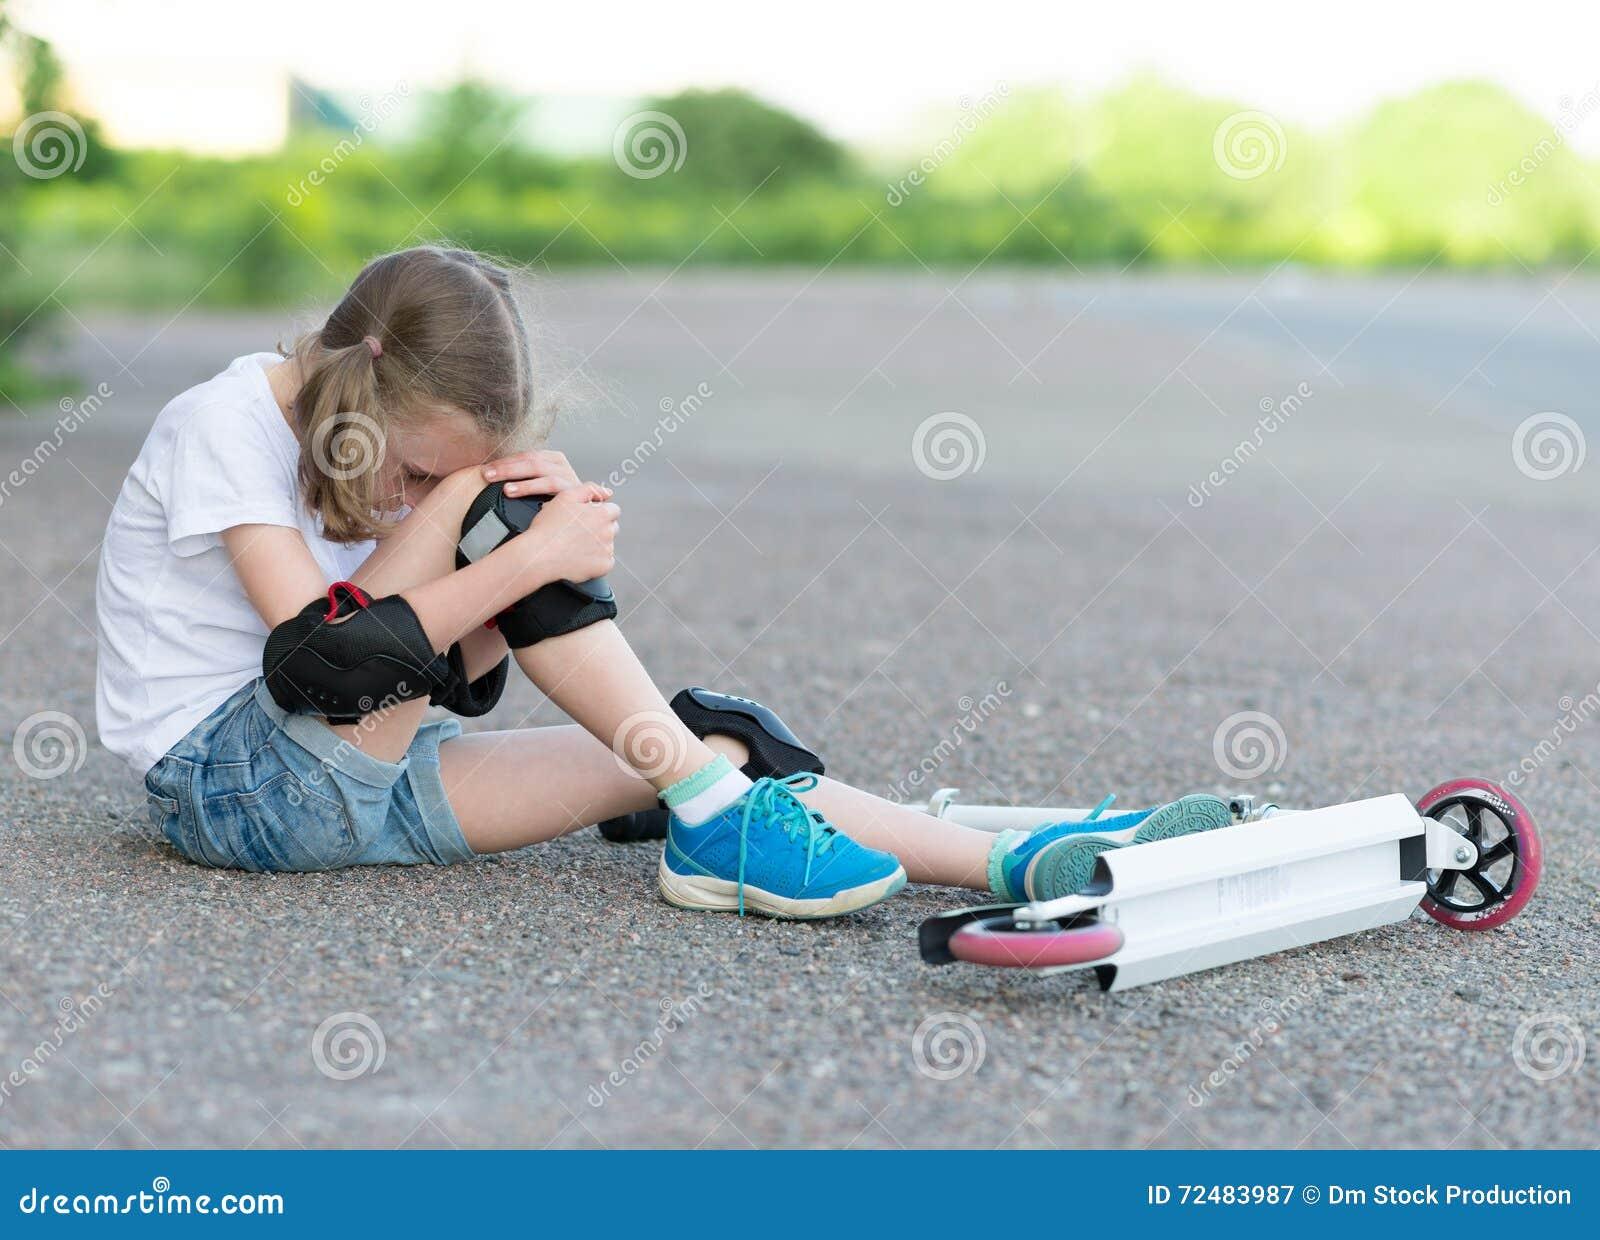 Фото упала девушек